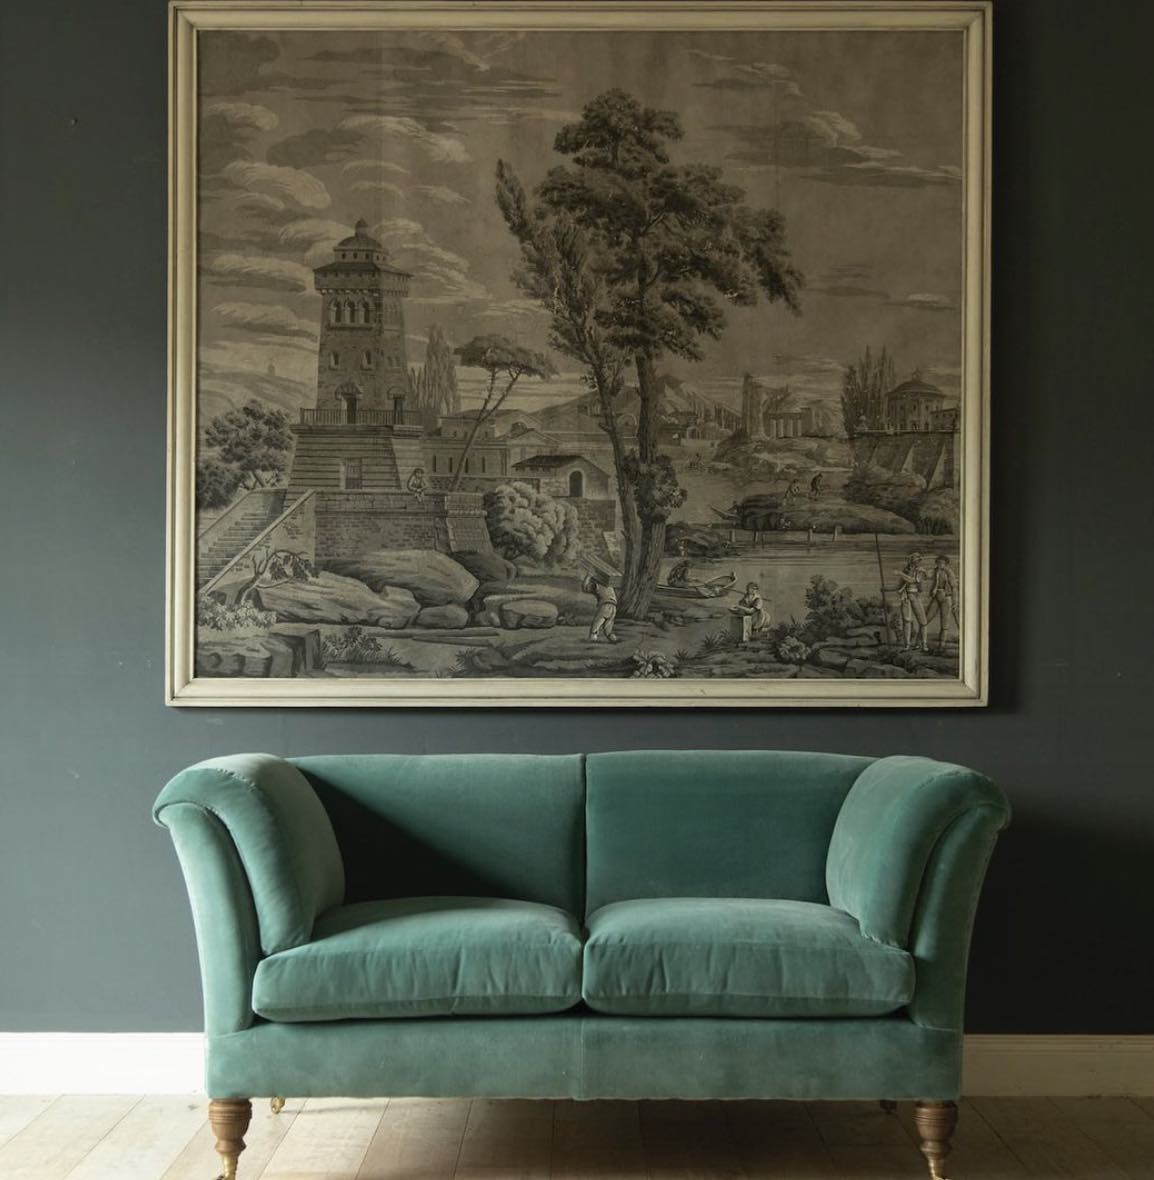 Mulberry Home - Velvet Aqua